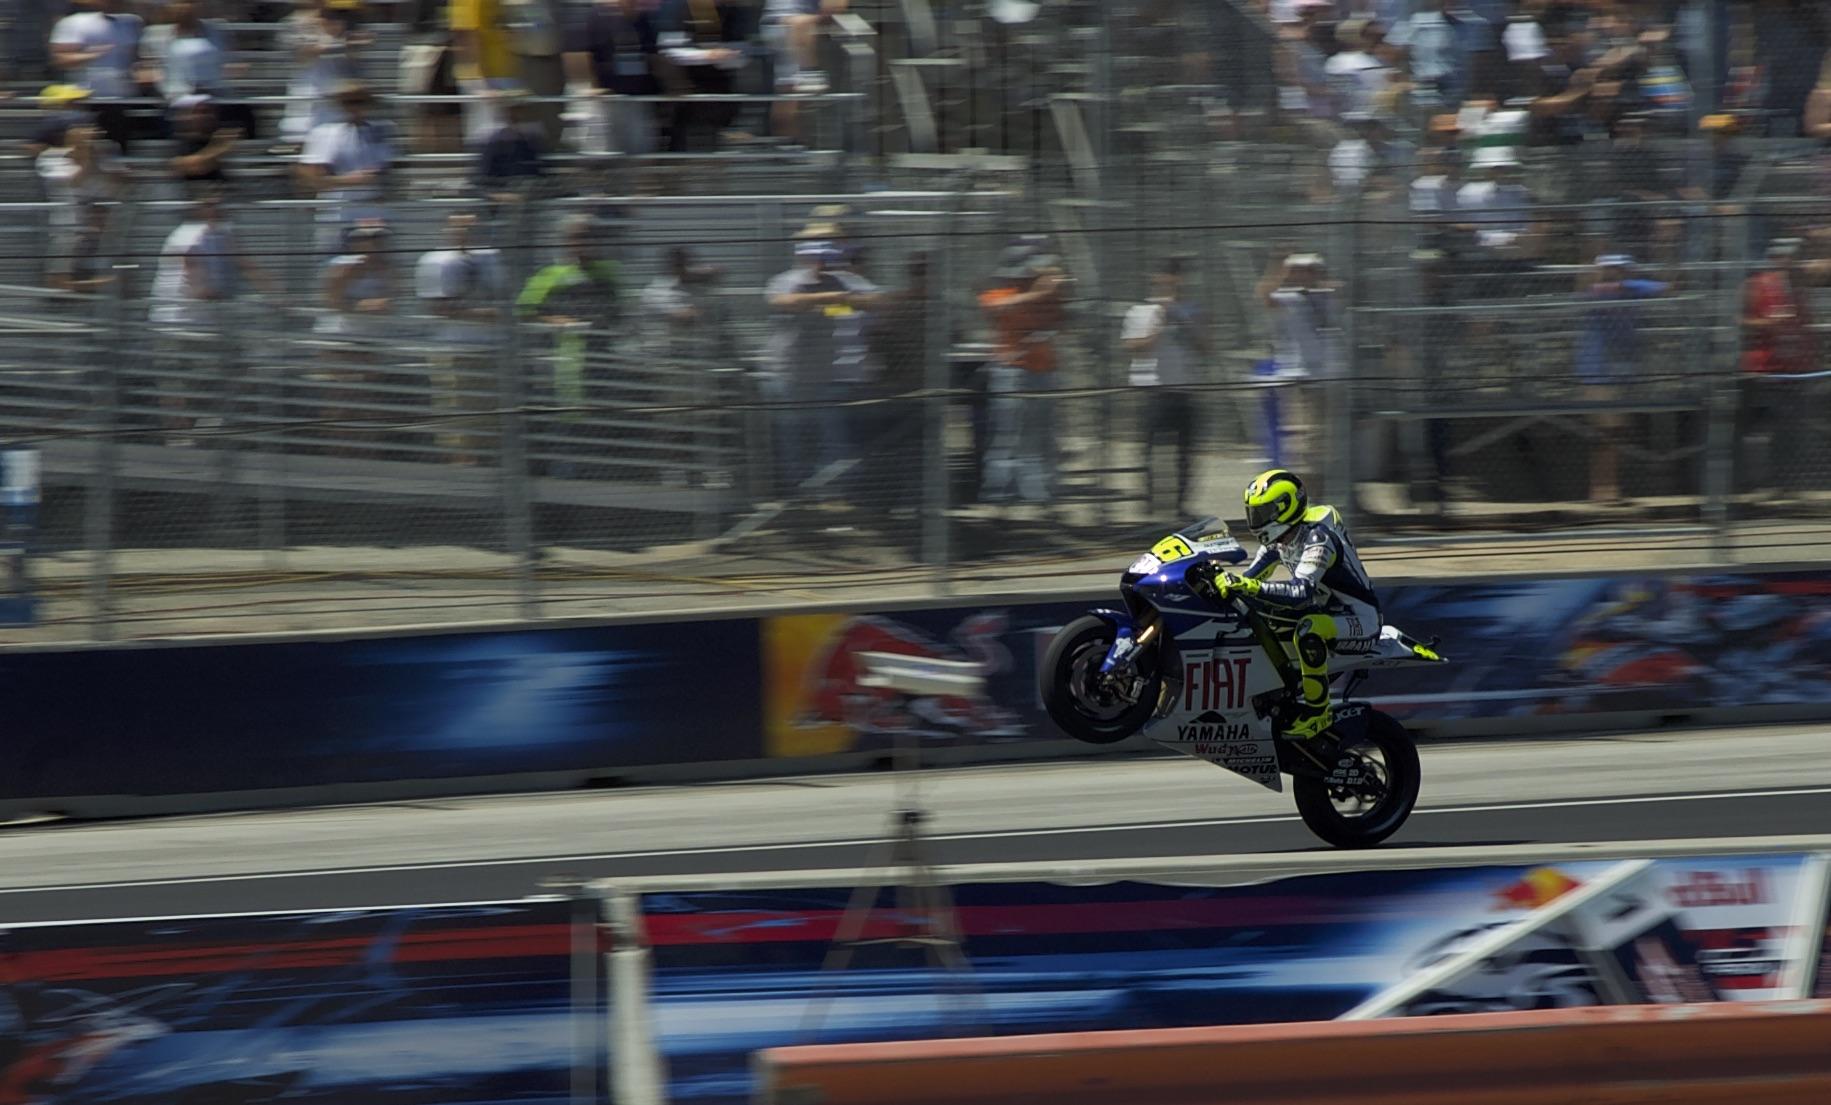 Rossi wheelie happy to get 4th.